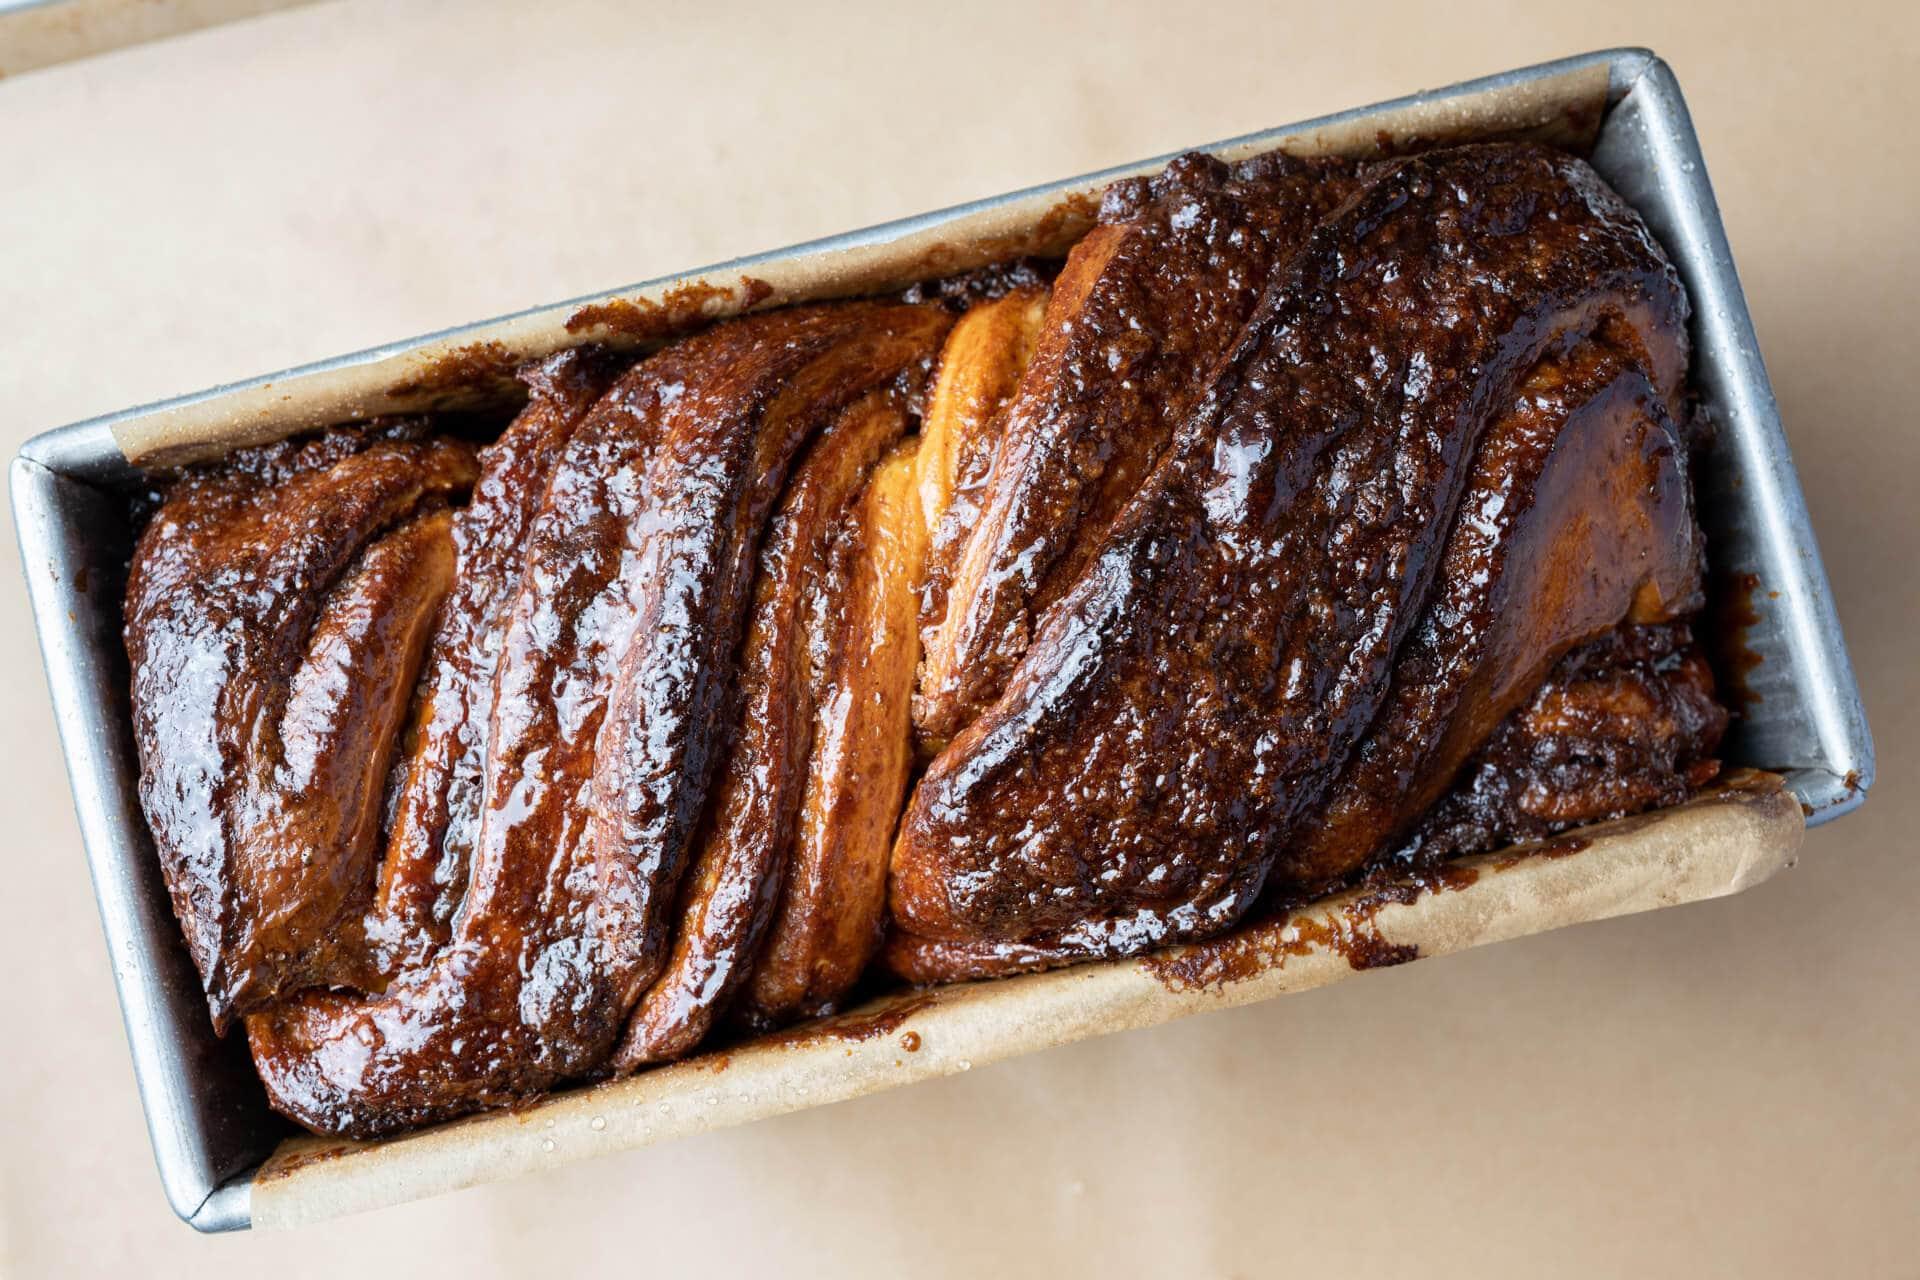 Sourdough babka crust